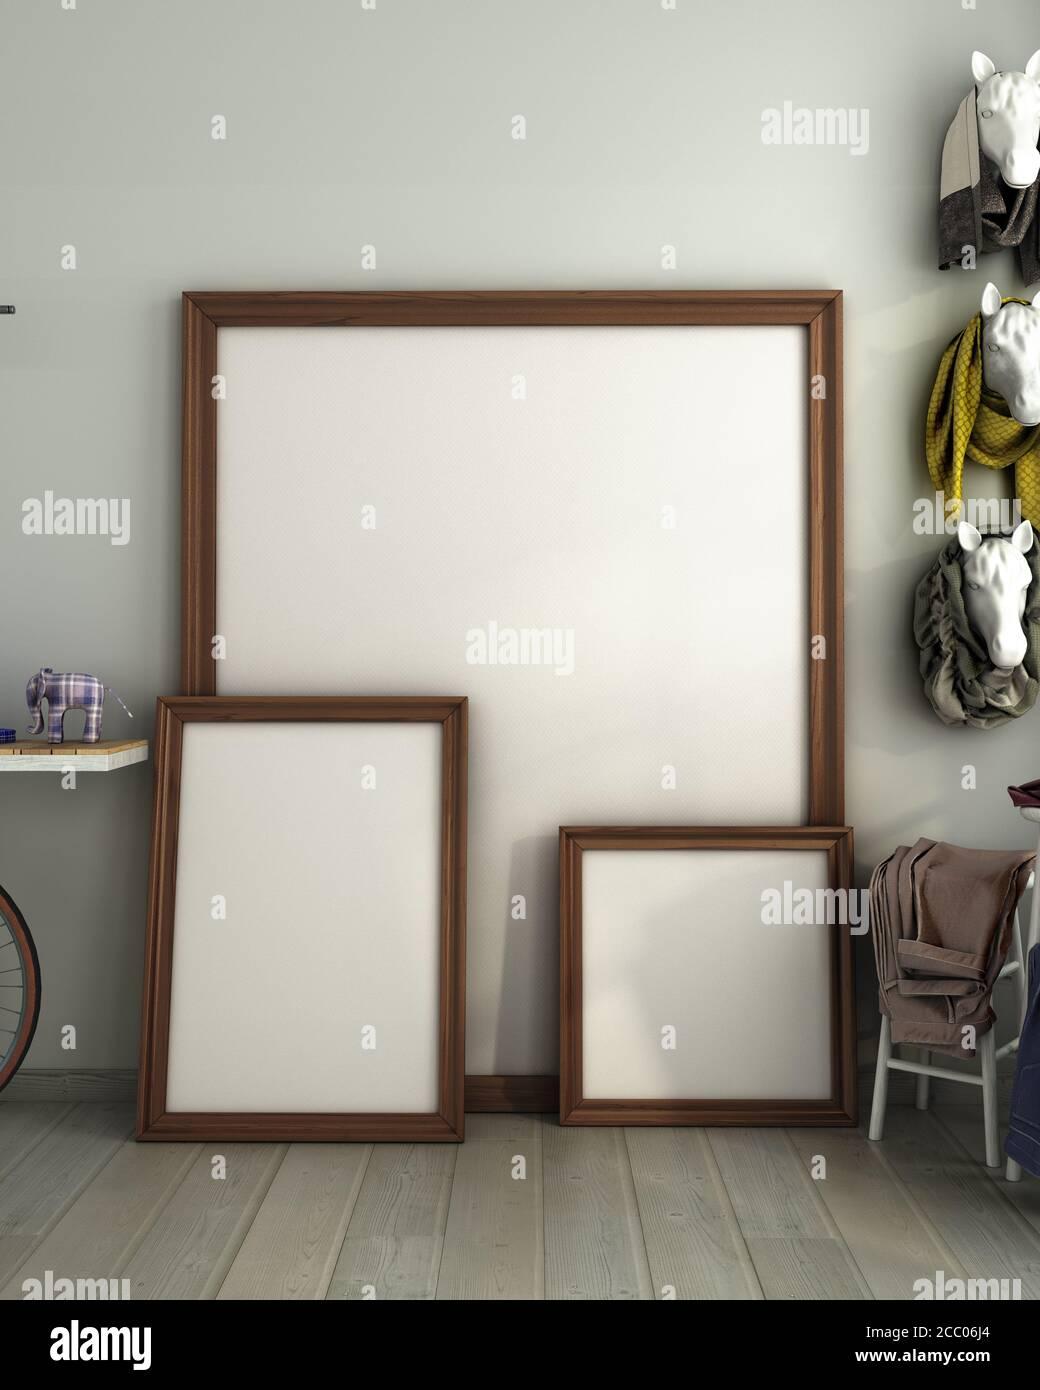 Mock Up Different Size Poster Frames In Modern Interior Background Color Living Room 3d Render Stock Photo Alamy